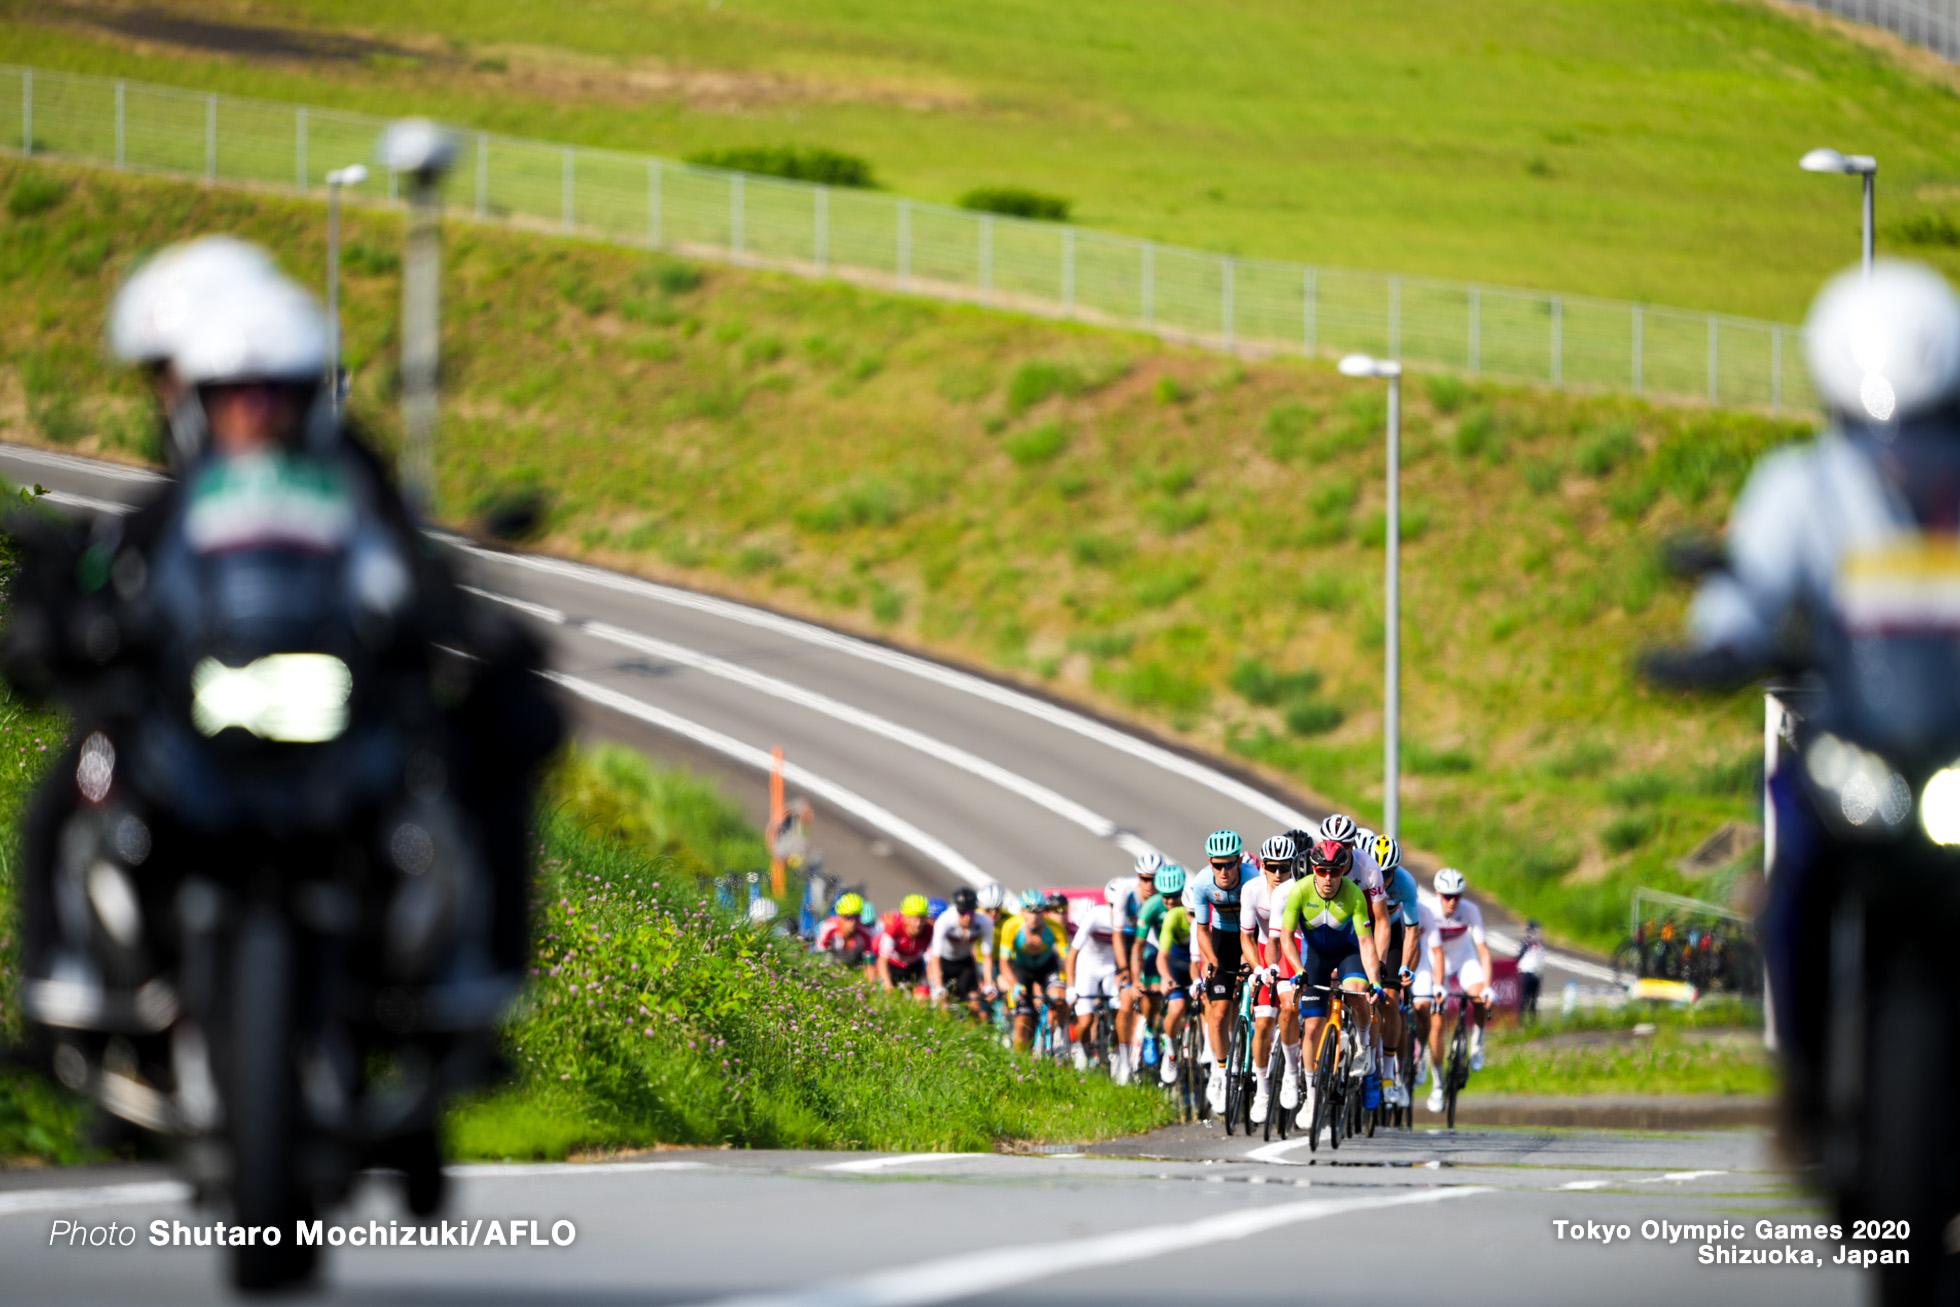 JULY 24, 2021 - Cycling : Men's Road Race during the Tokyo 2020 Olympic Games at 富士スピードウェイ/the Fuji International Speedway in Shizuoka, Japan. (Photo by Shutaro Mochizuki/AFLO)